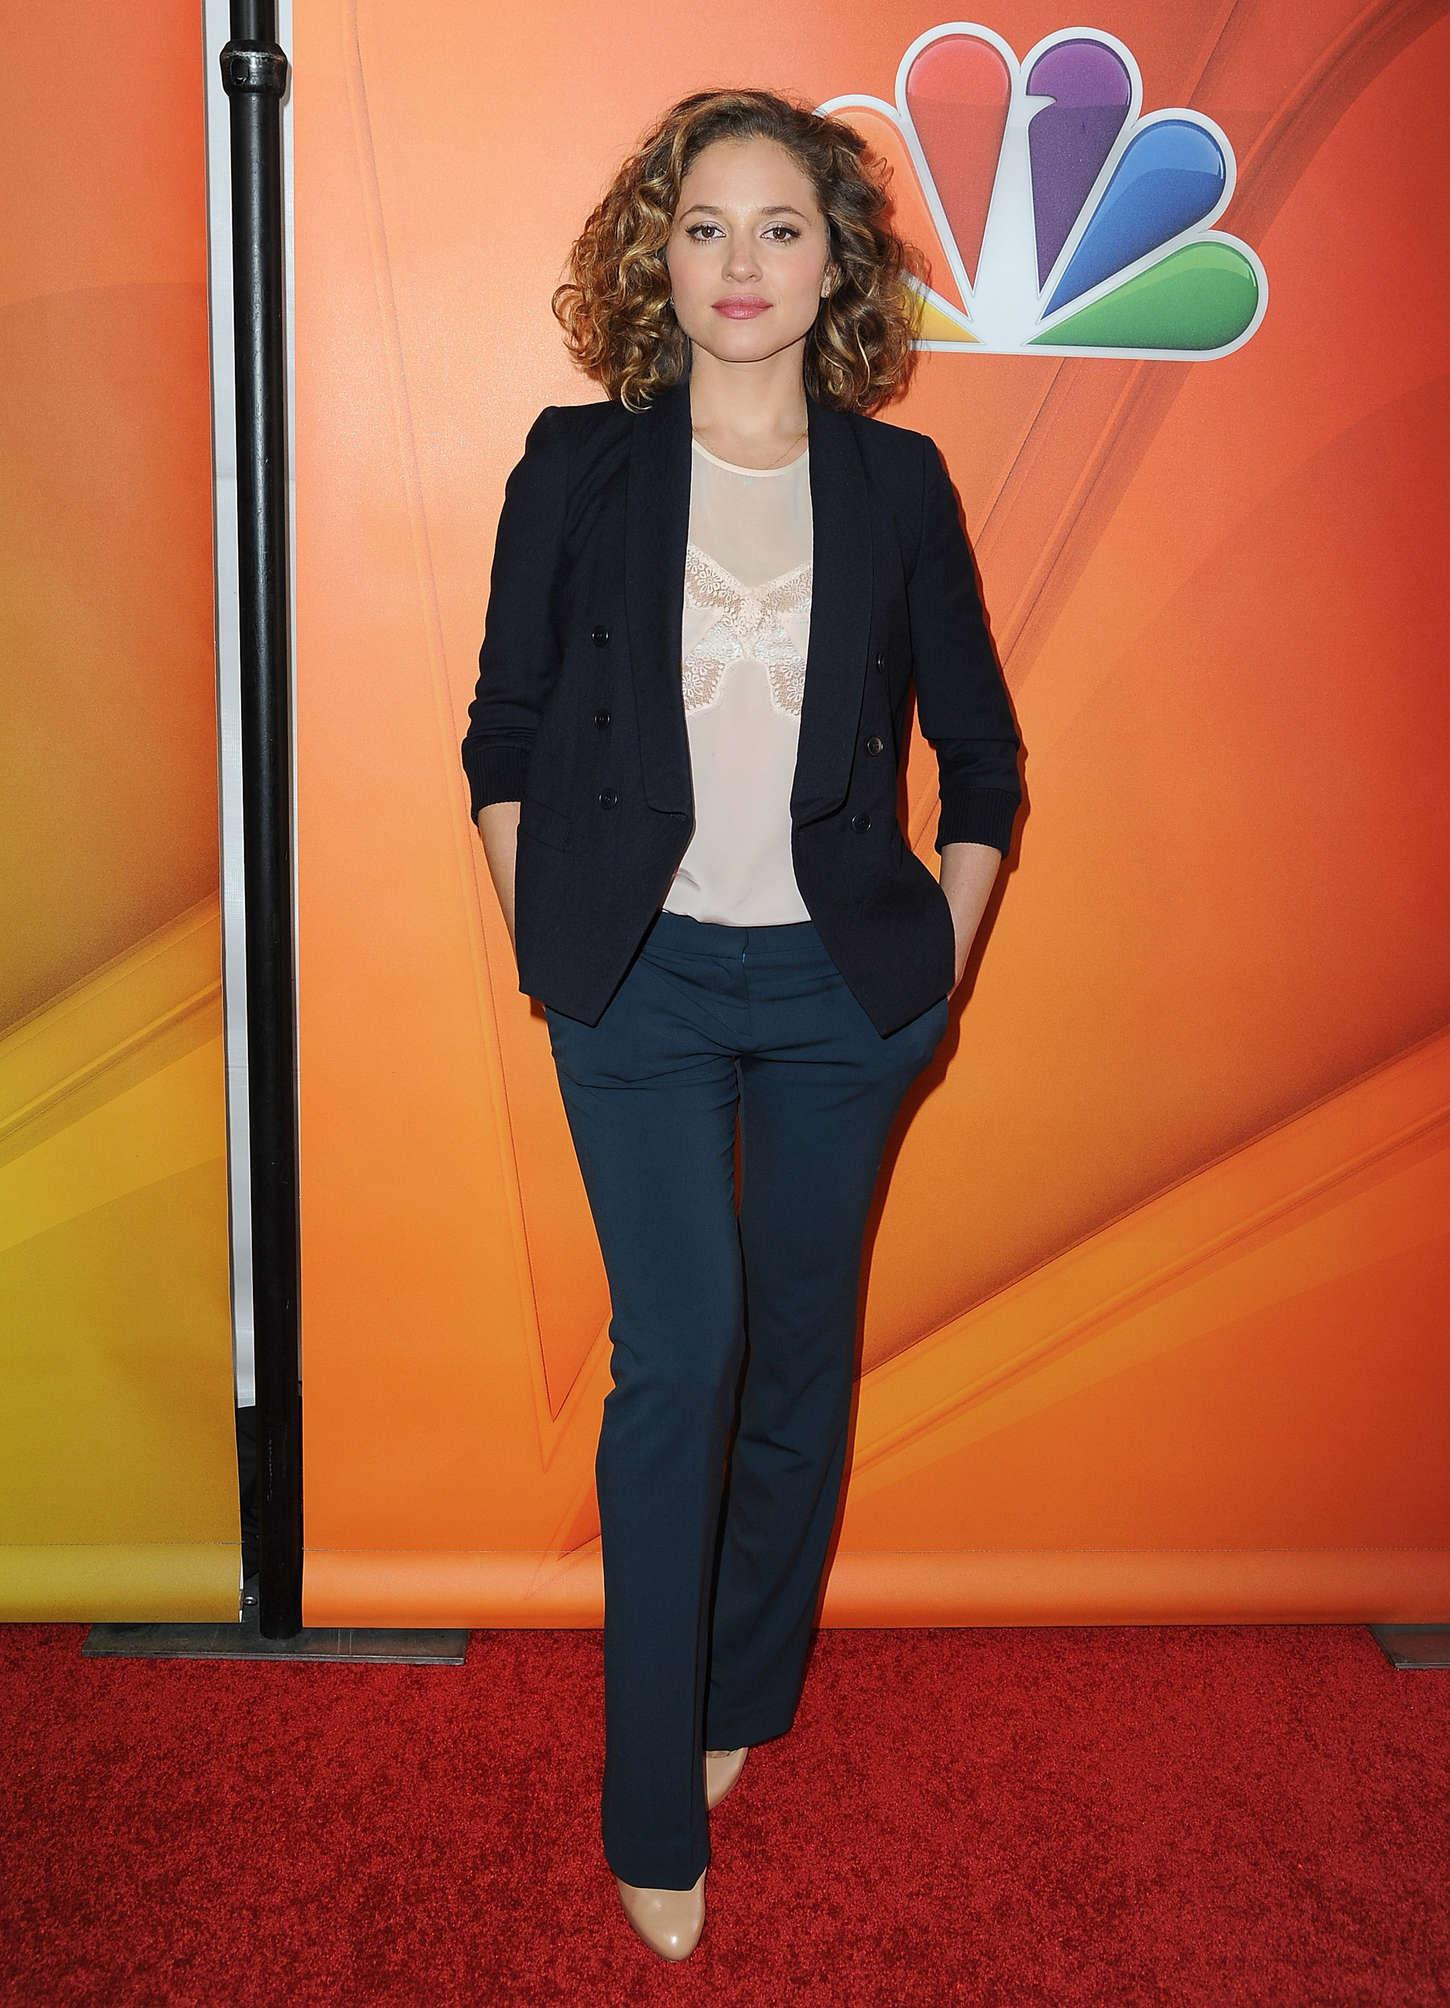 Margarita Levieva NBCUniversal Press Tour Day in Pasadena